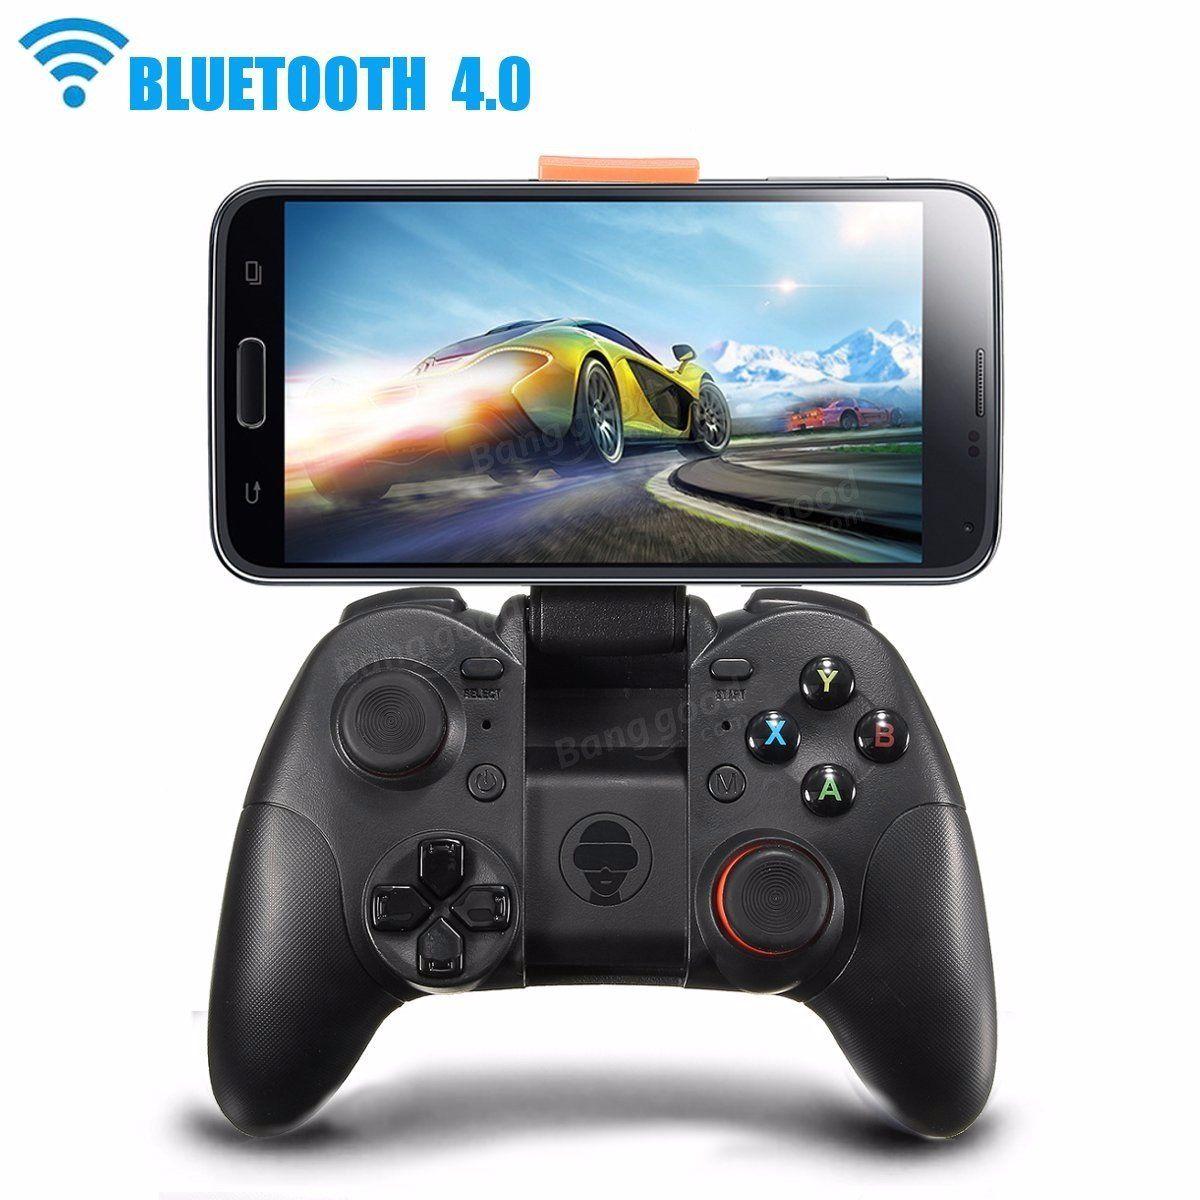 Bluetooth 4.0 Wireless Game Controller Gamepad Joystick